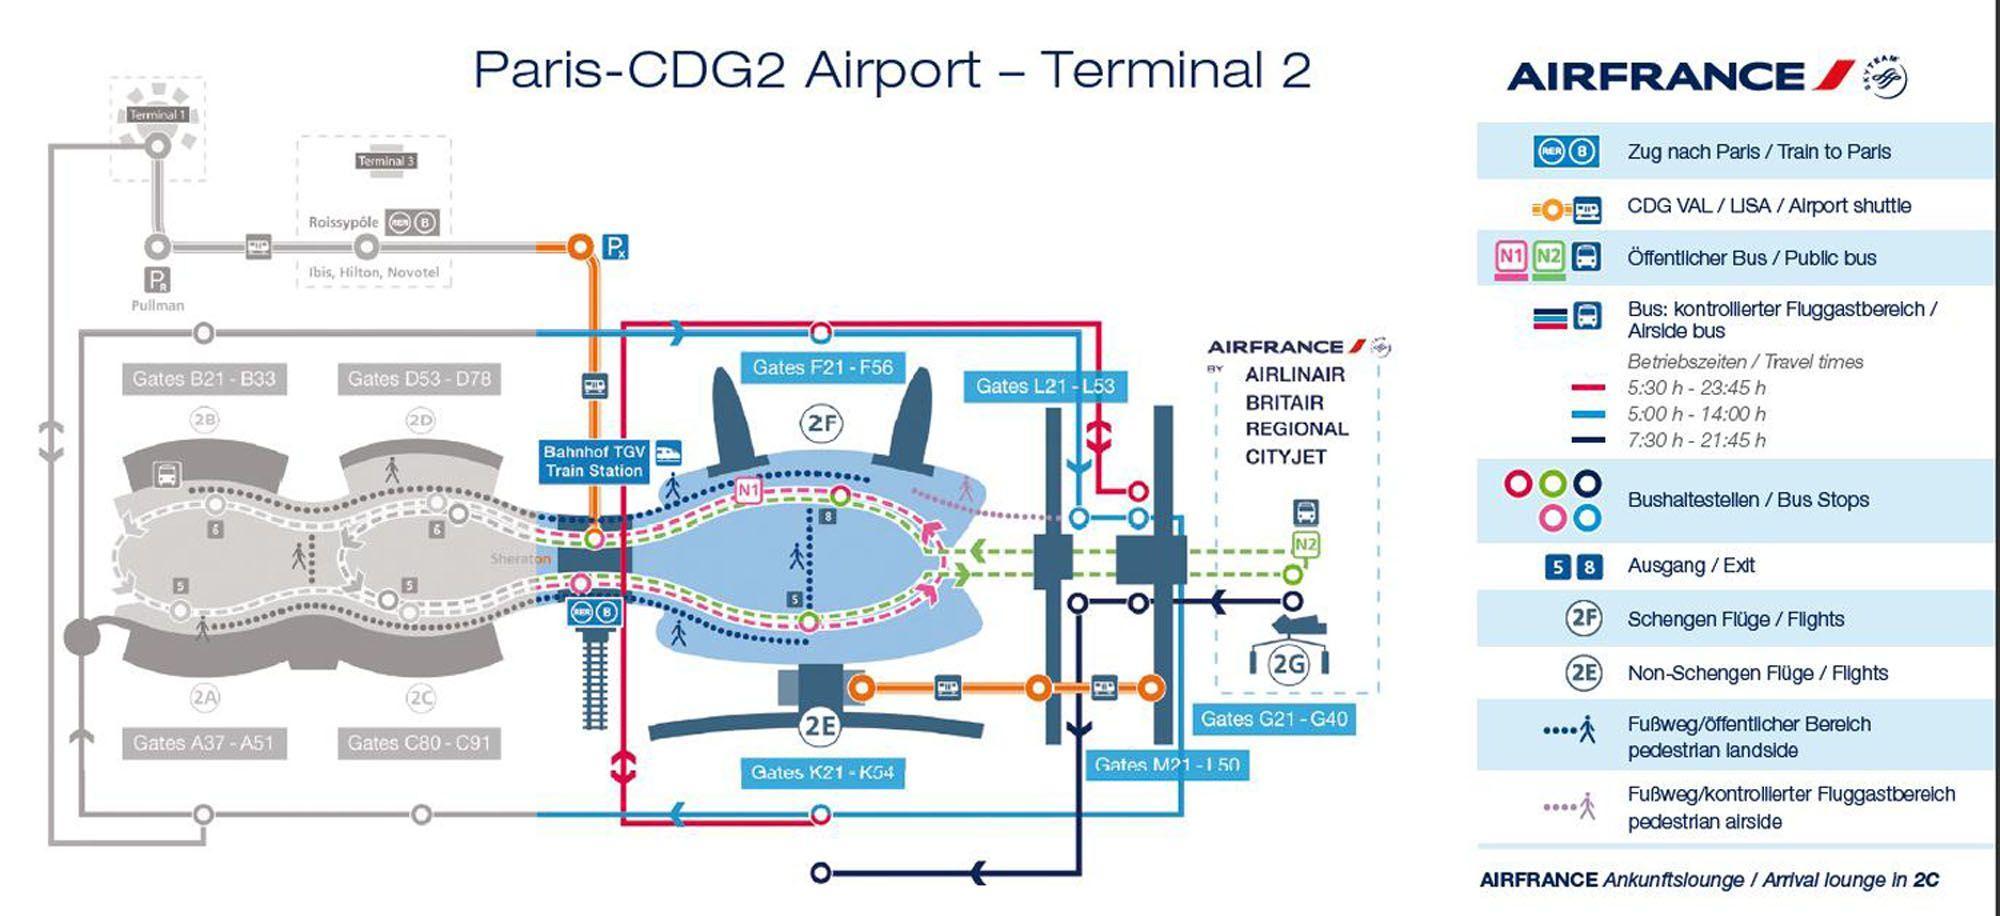 Charles de gaulle airport map terminal 2 - Terminal 2 map ...